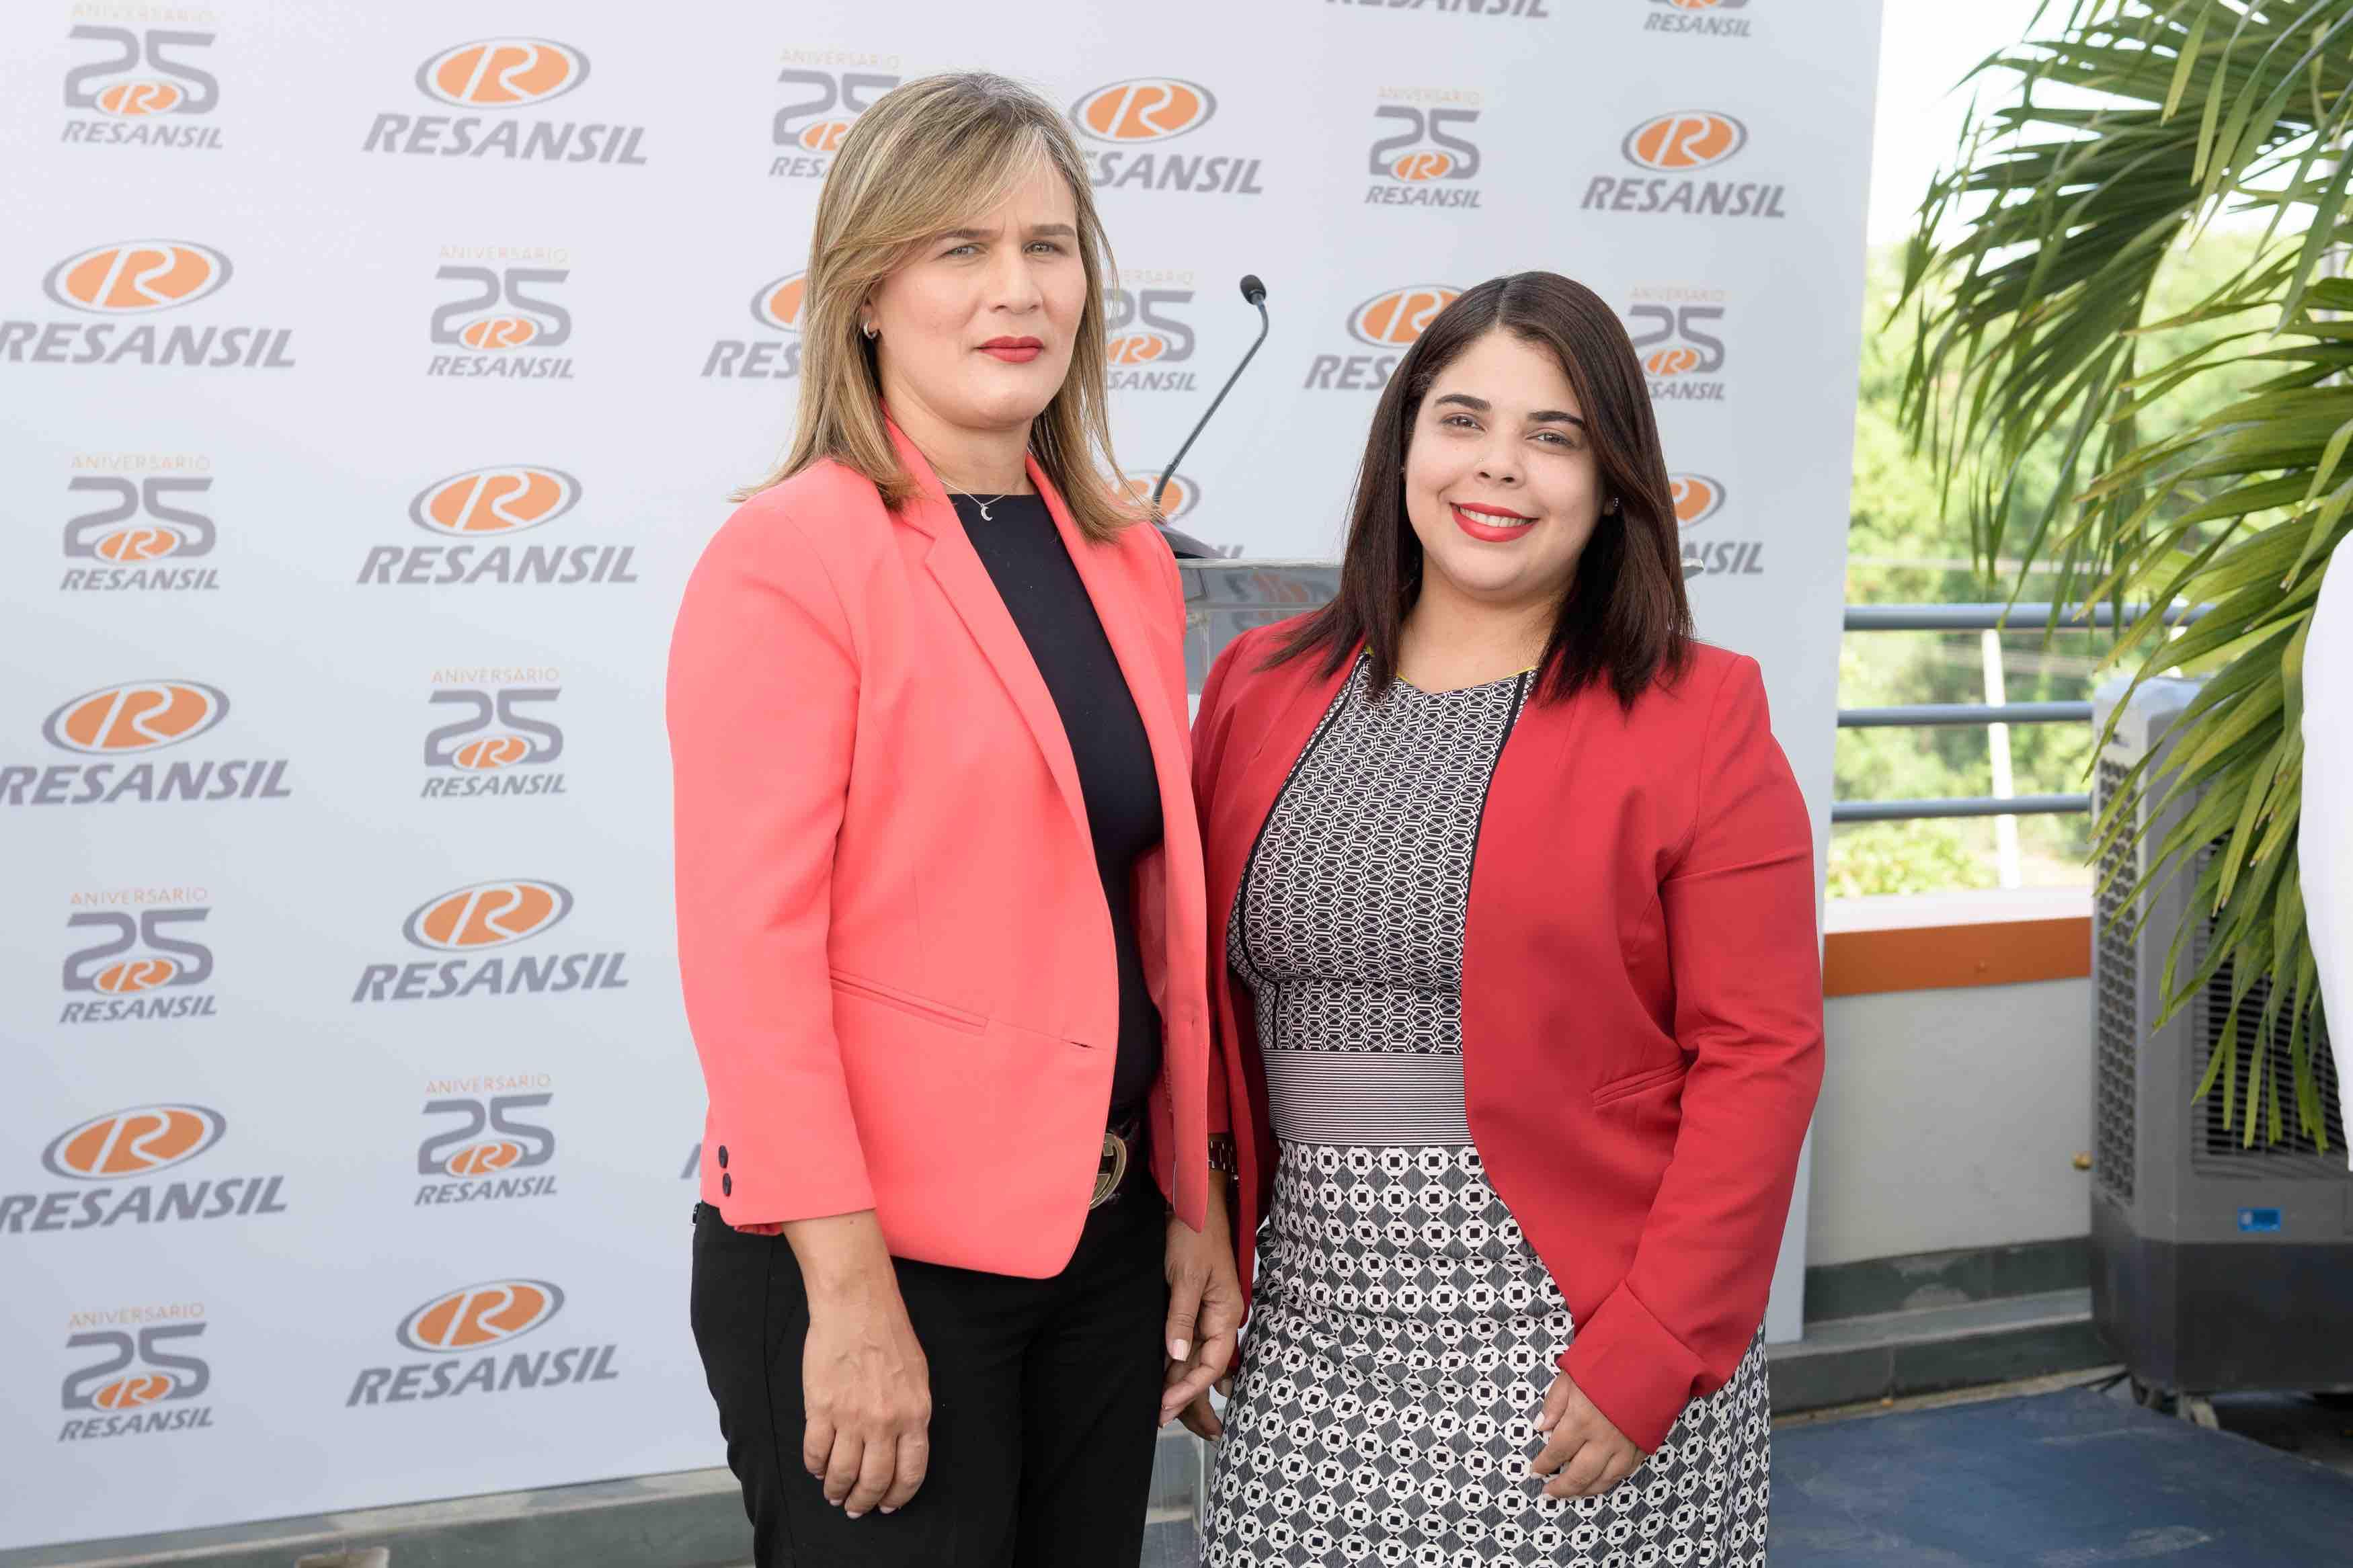 12. Inés Pimentel & Delia Ortiz